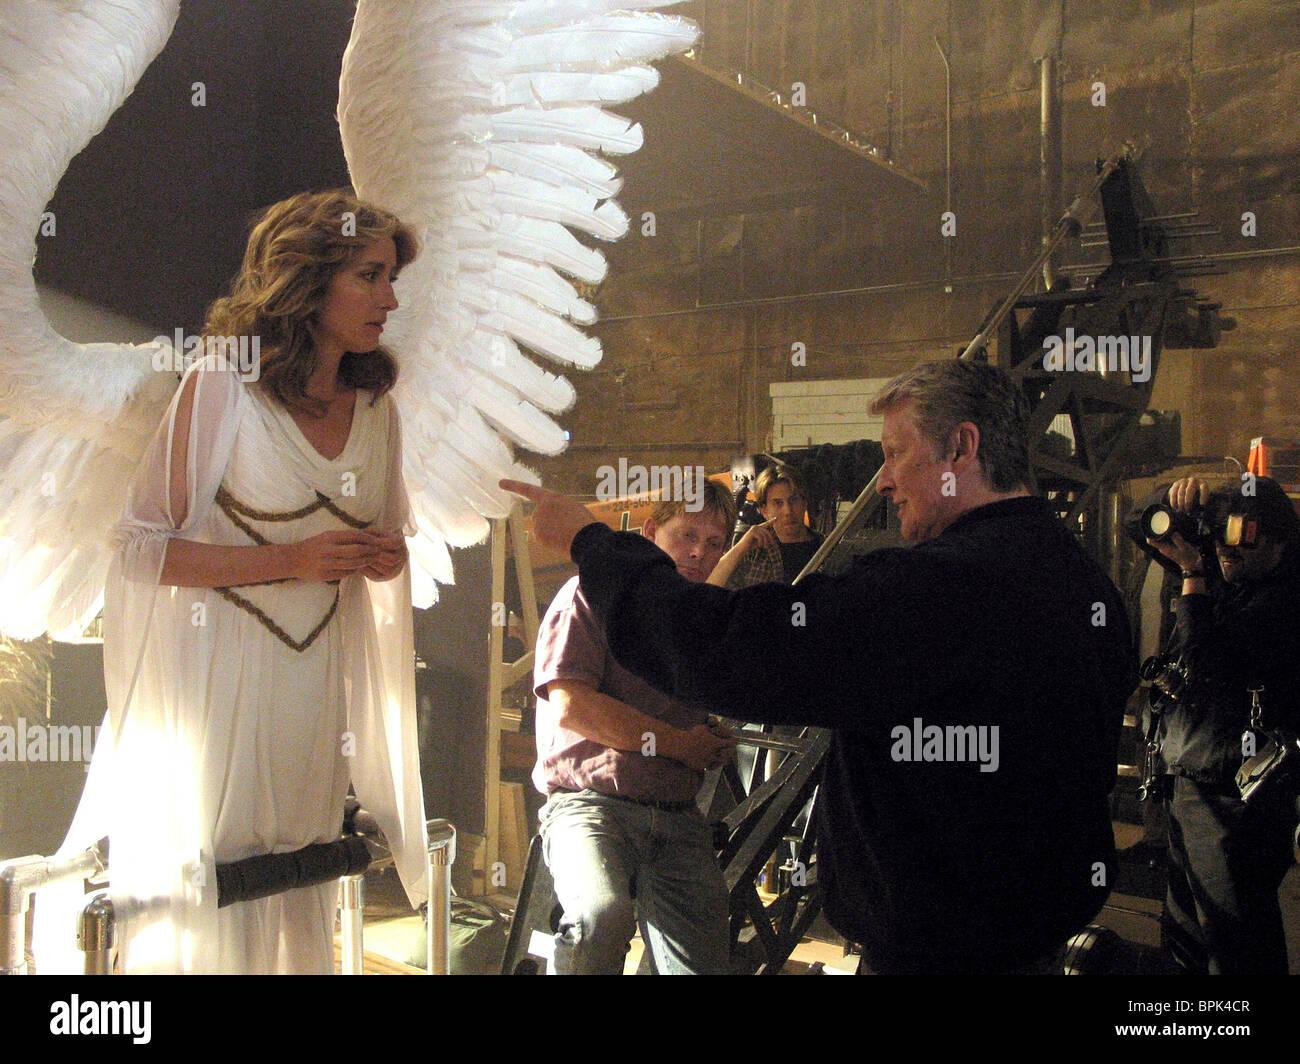 EMMA THOMPSON & MIKE NICHOLS ANGELS IN AMERICA (2003) - Stock Image